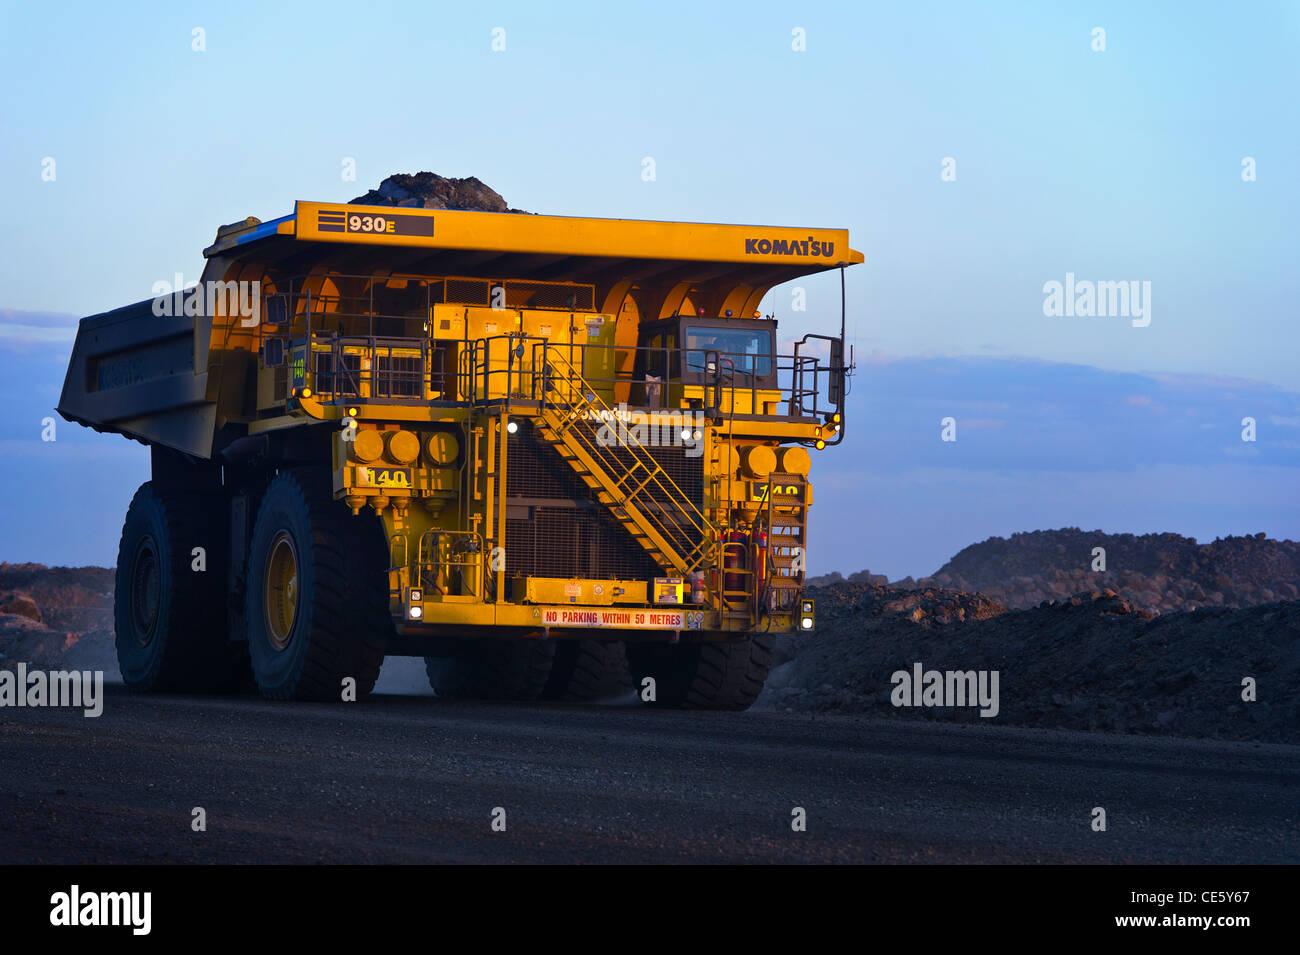 Coal mining dump truck, Clermont Mines QLD Australia Stock Photo: 43157023 - Alamy